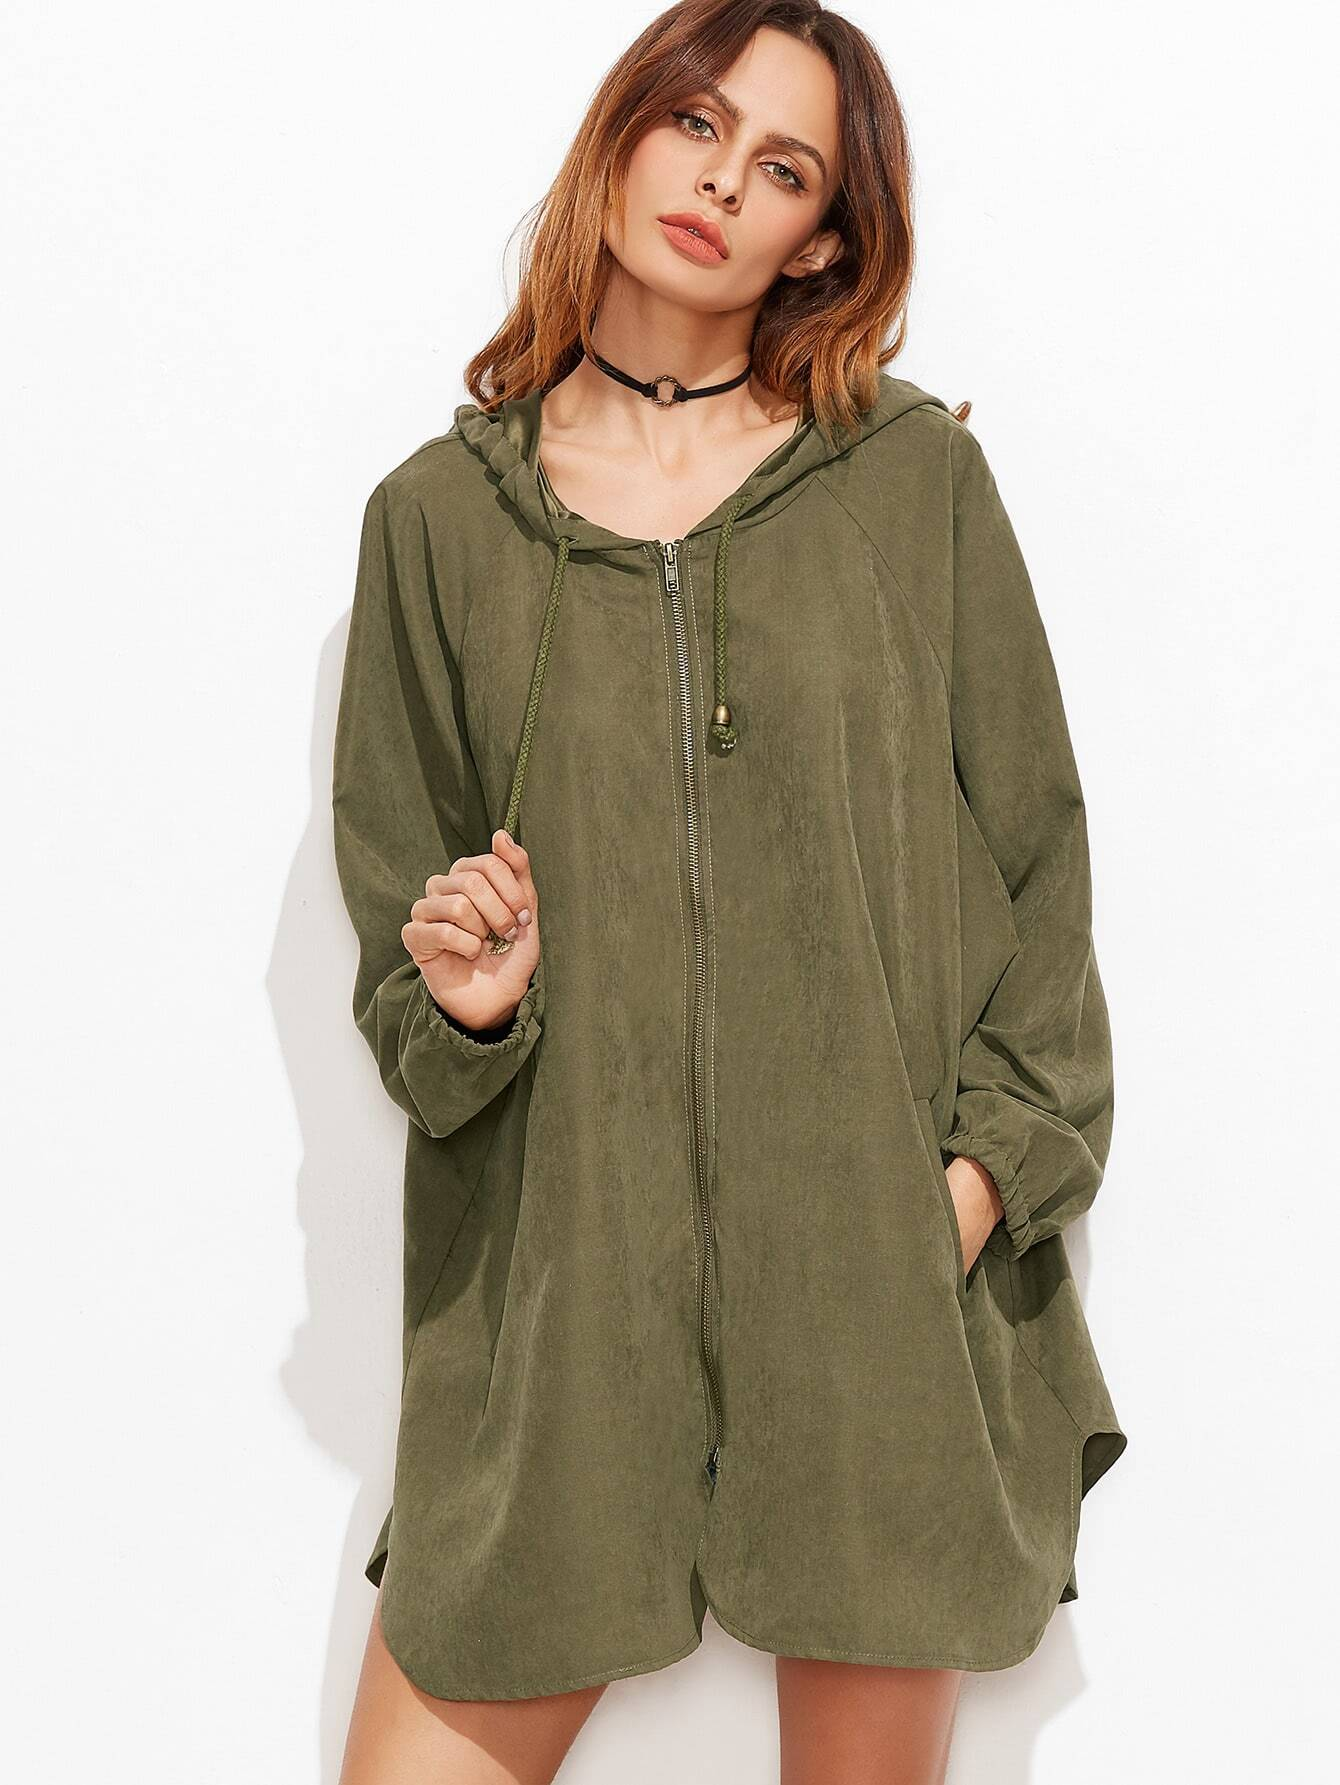 Olive Green Zipper Front Hooded Raglan Sleeve Swing Coat